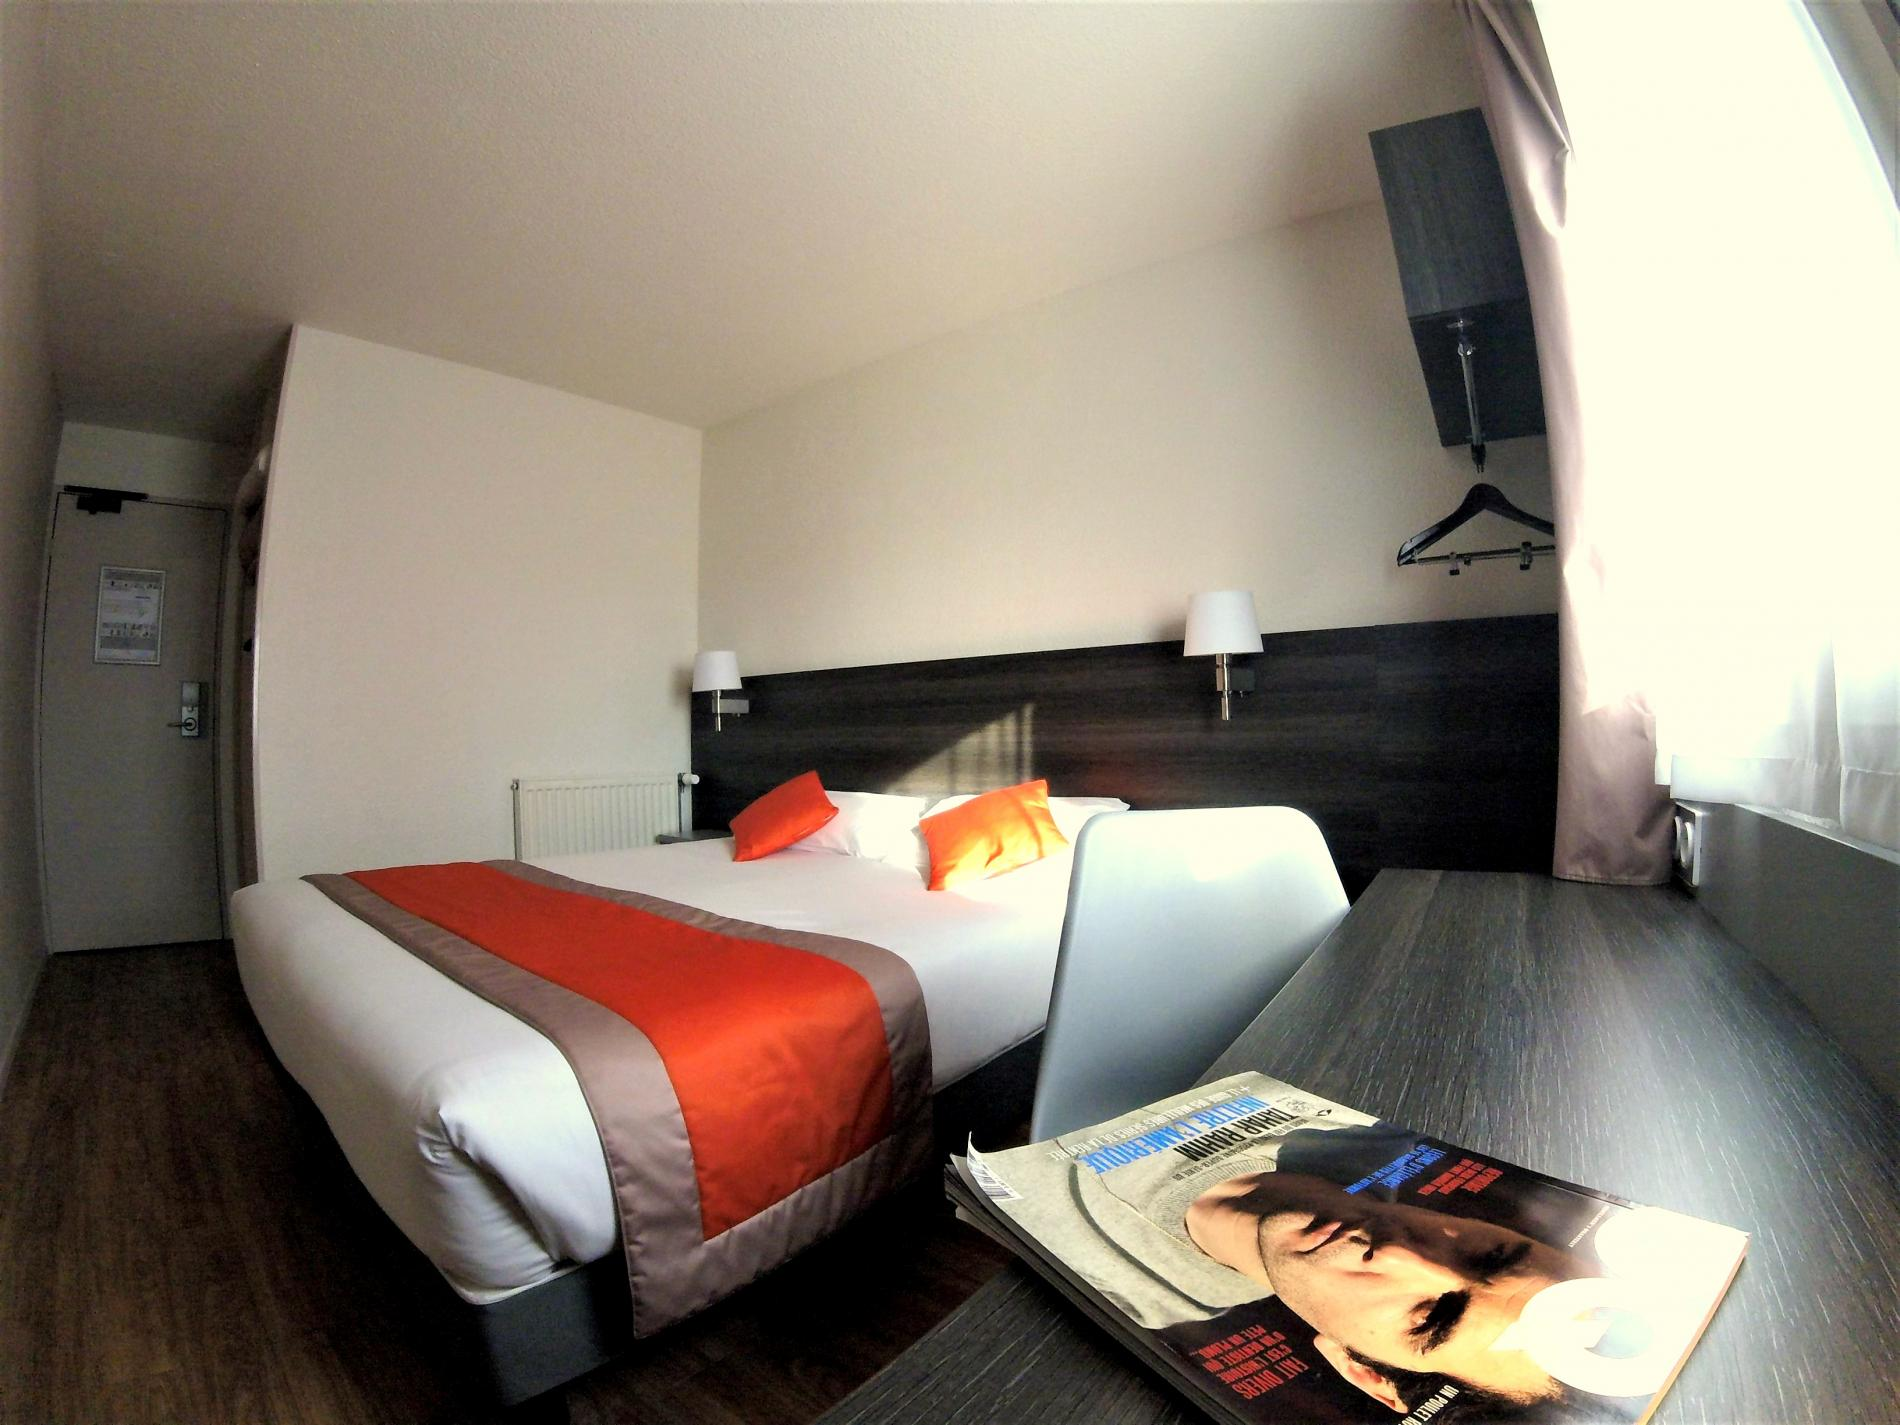 chambres familiales l h tel carline beaune proches hospices de beaune. Black Bedroom Furniture Sets. Home Design Ideas